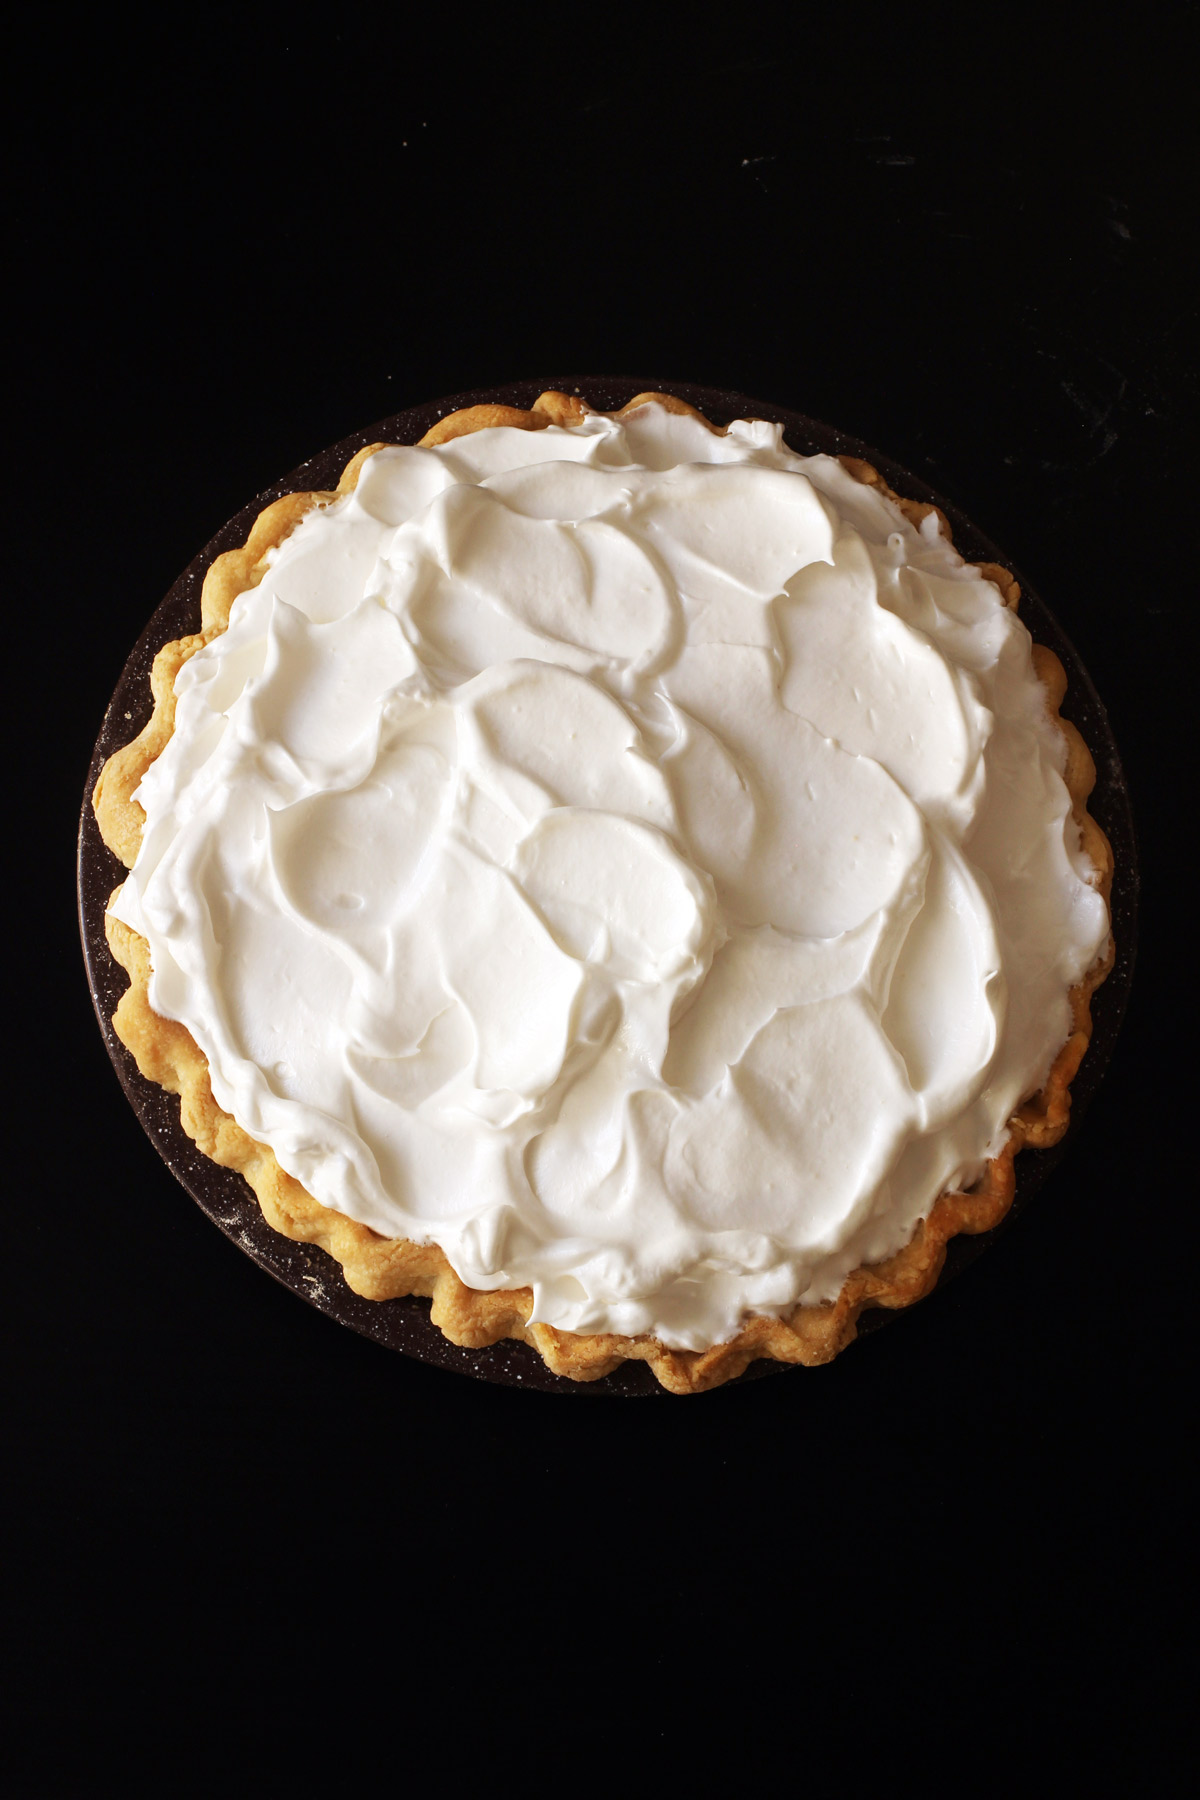 pie covered in meringue